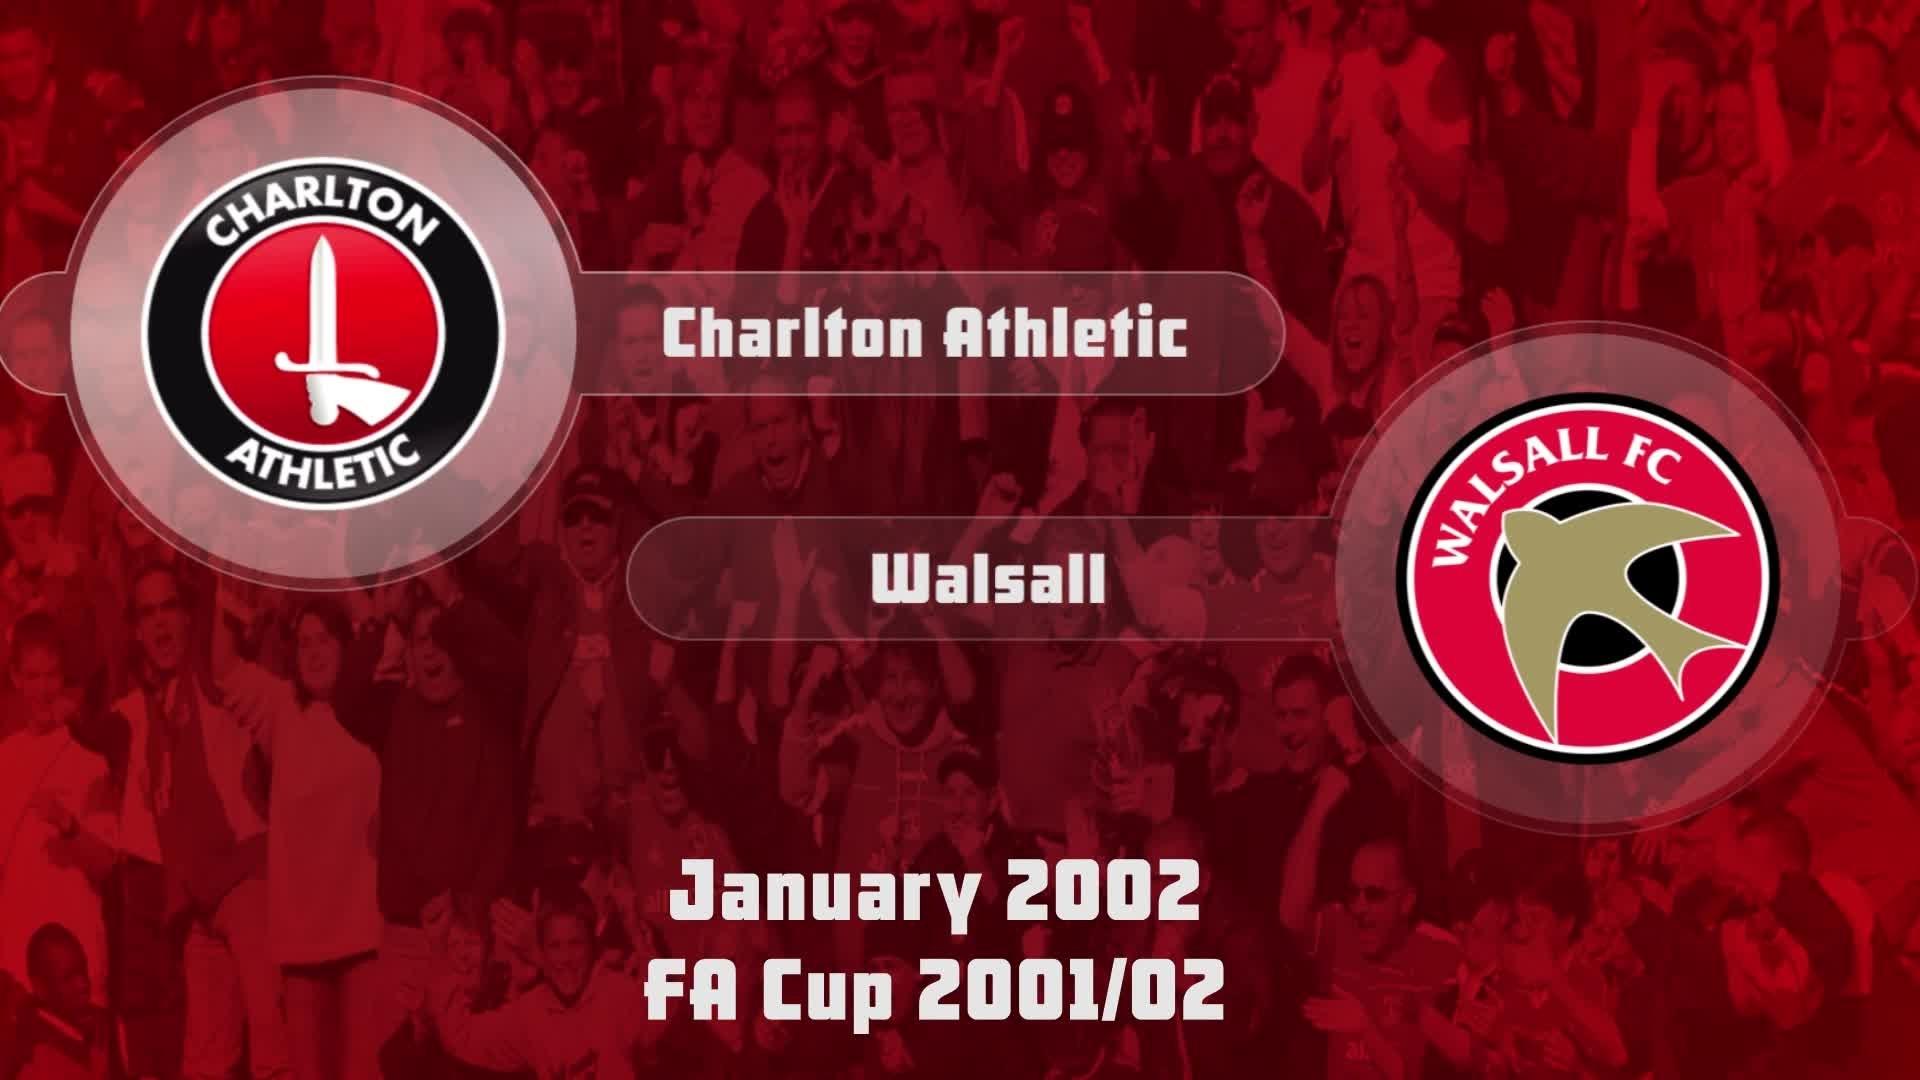 28 HIGHLIGHTS | Charlton 1 Walsall 2 (Jan 2002)